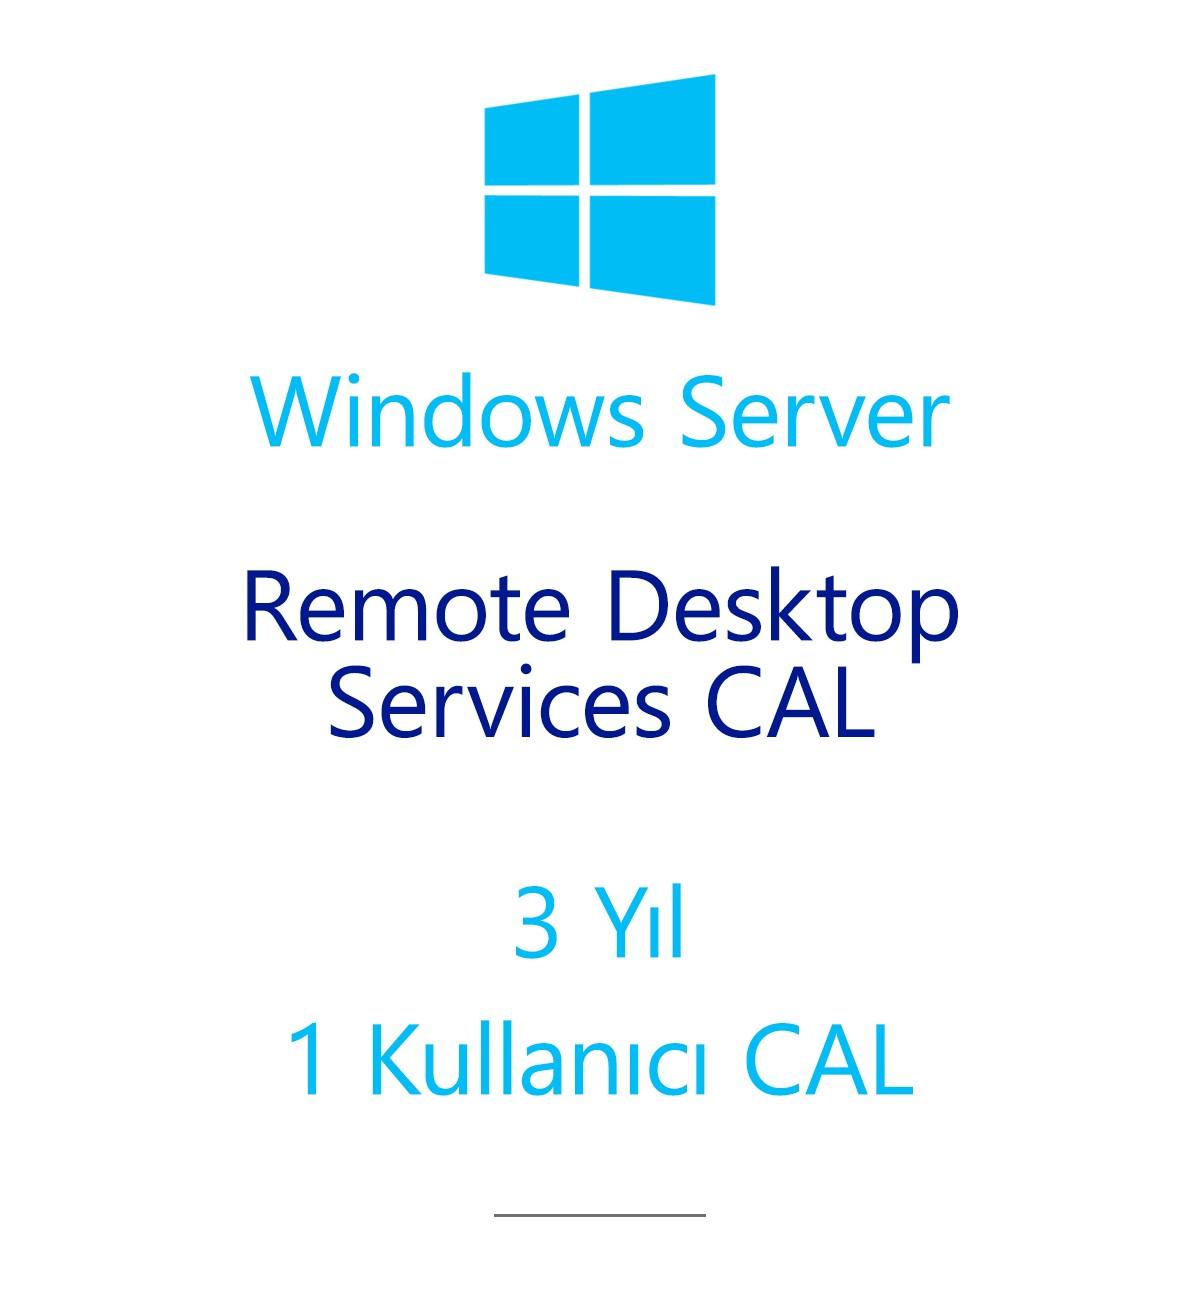 Windows Server Remote Desktop Services CAL 3 Year - 1 User CAL